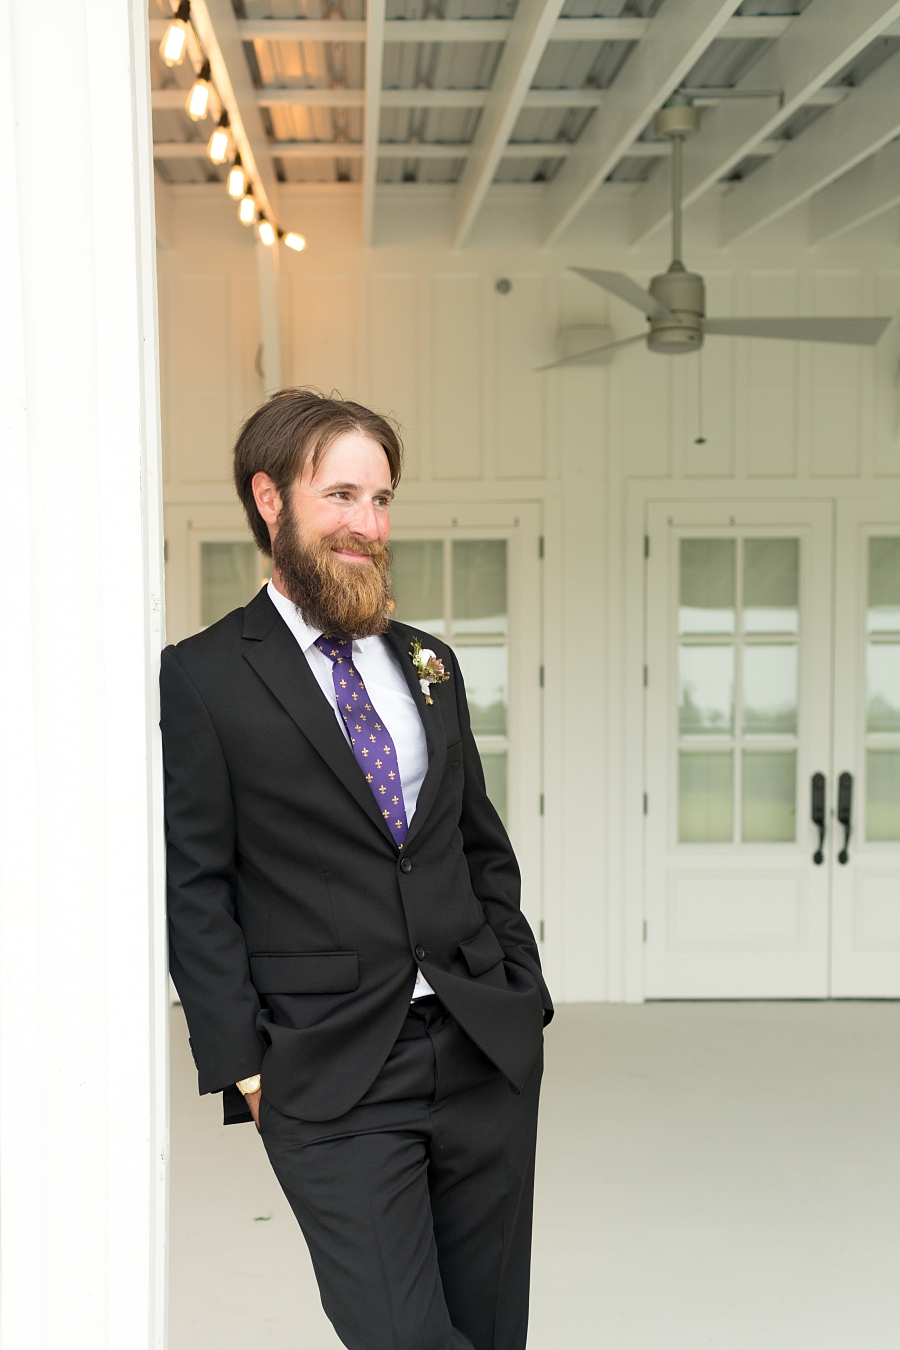 Stacy-Anderson-Photography-The-Farmhouse-Houston-Wedding-Photographer_0107.jpg